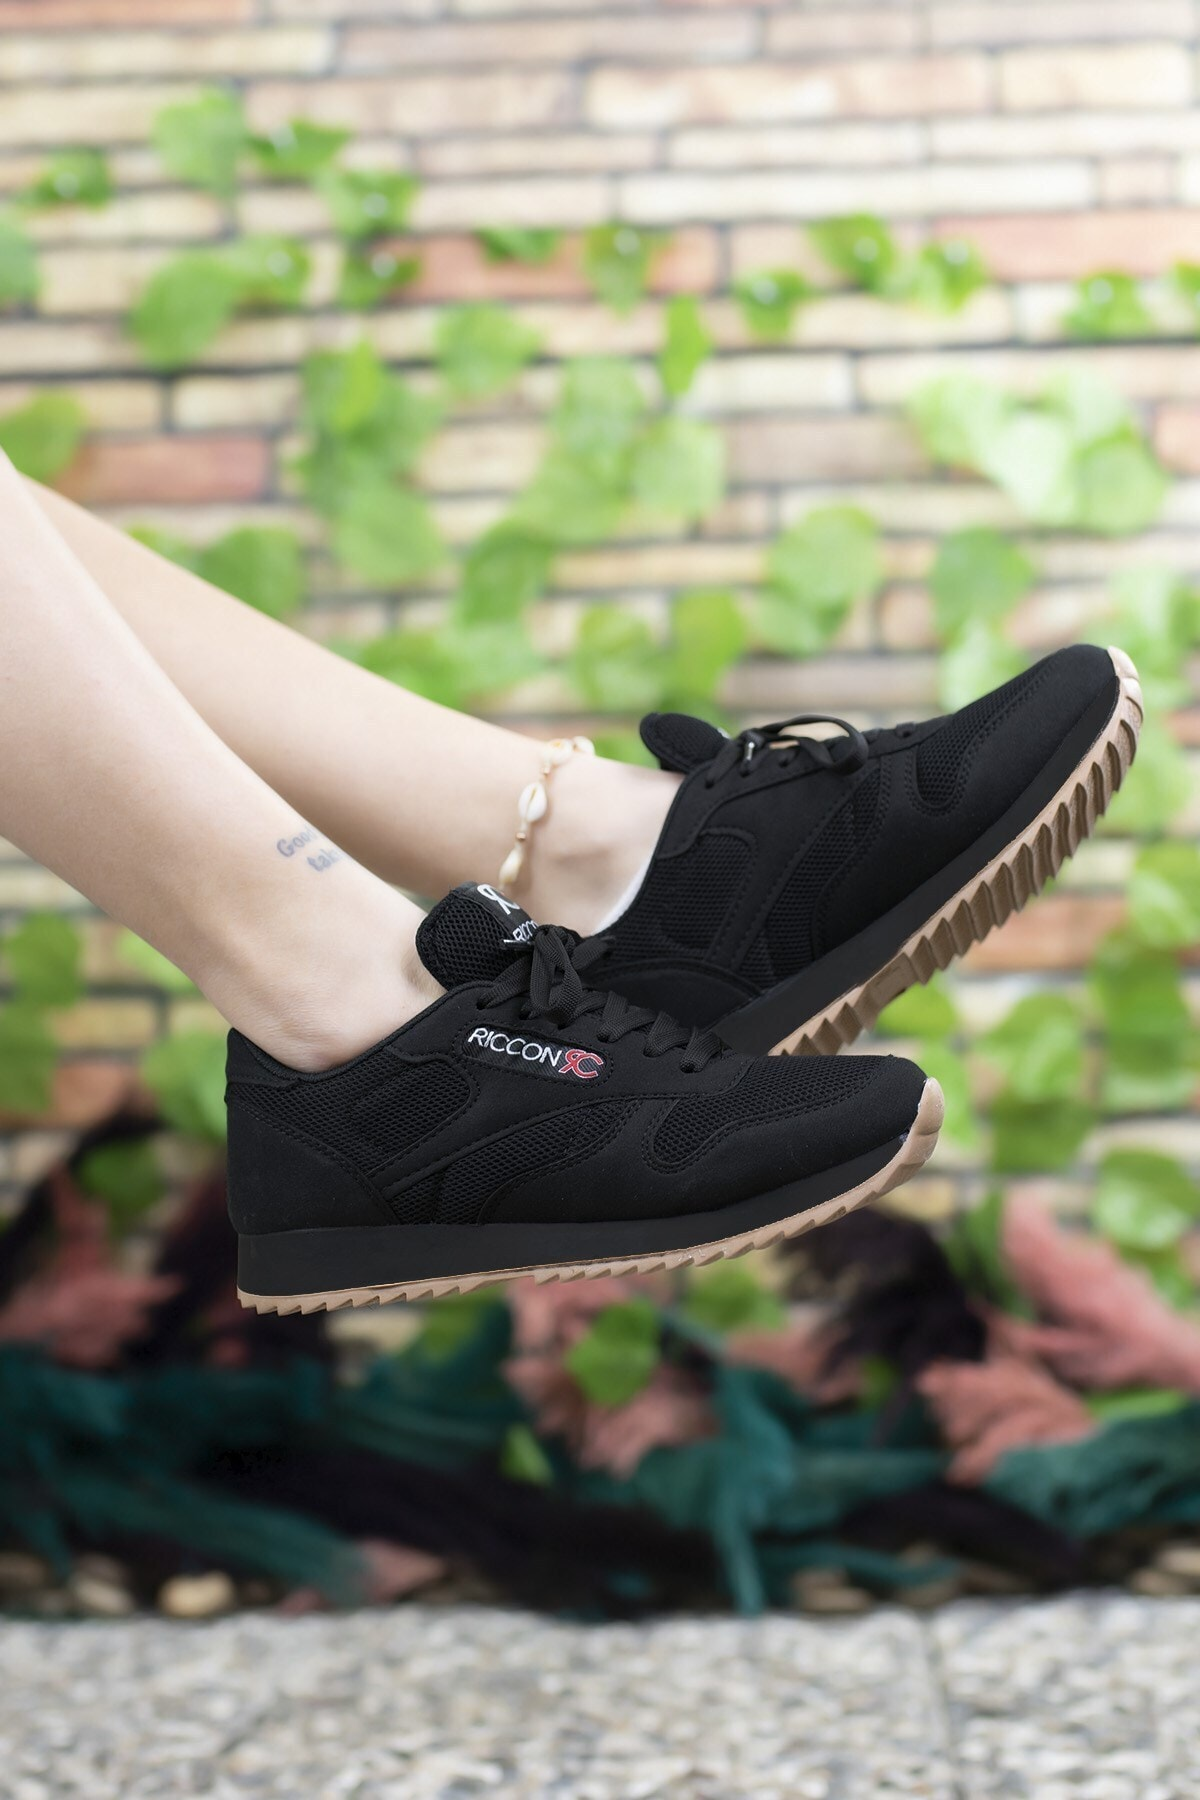 Riccon Siyah Siyah Unisex Sneaker 00121057 2